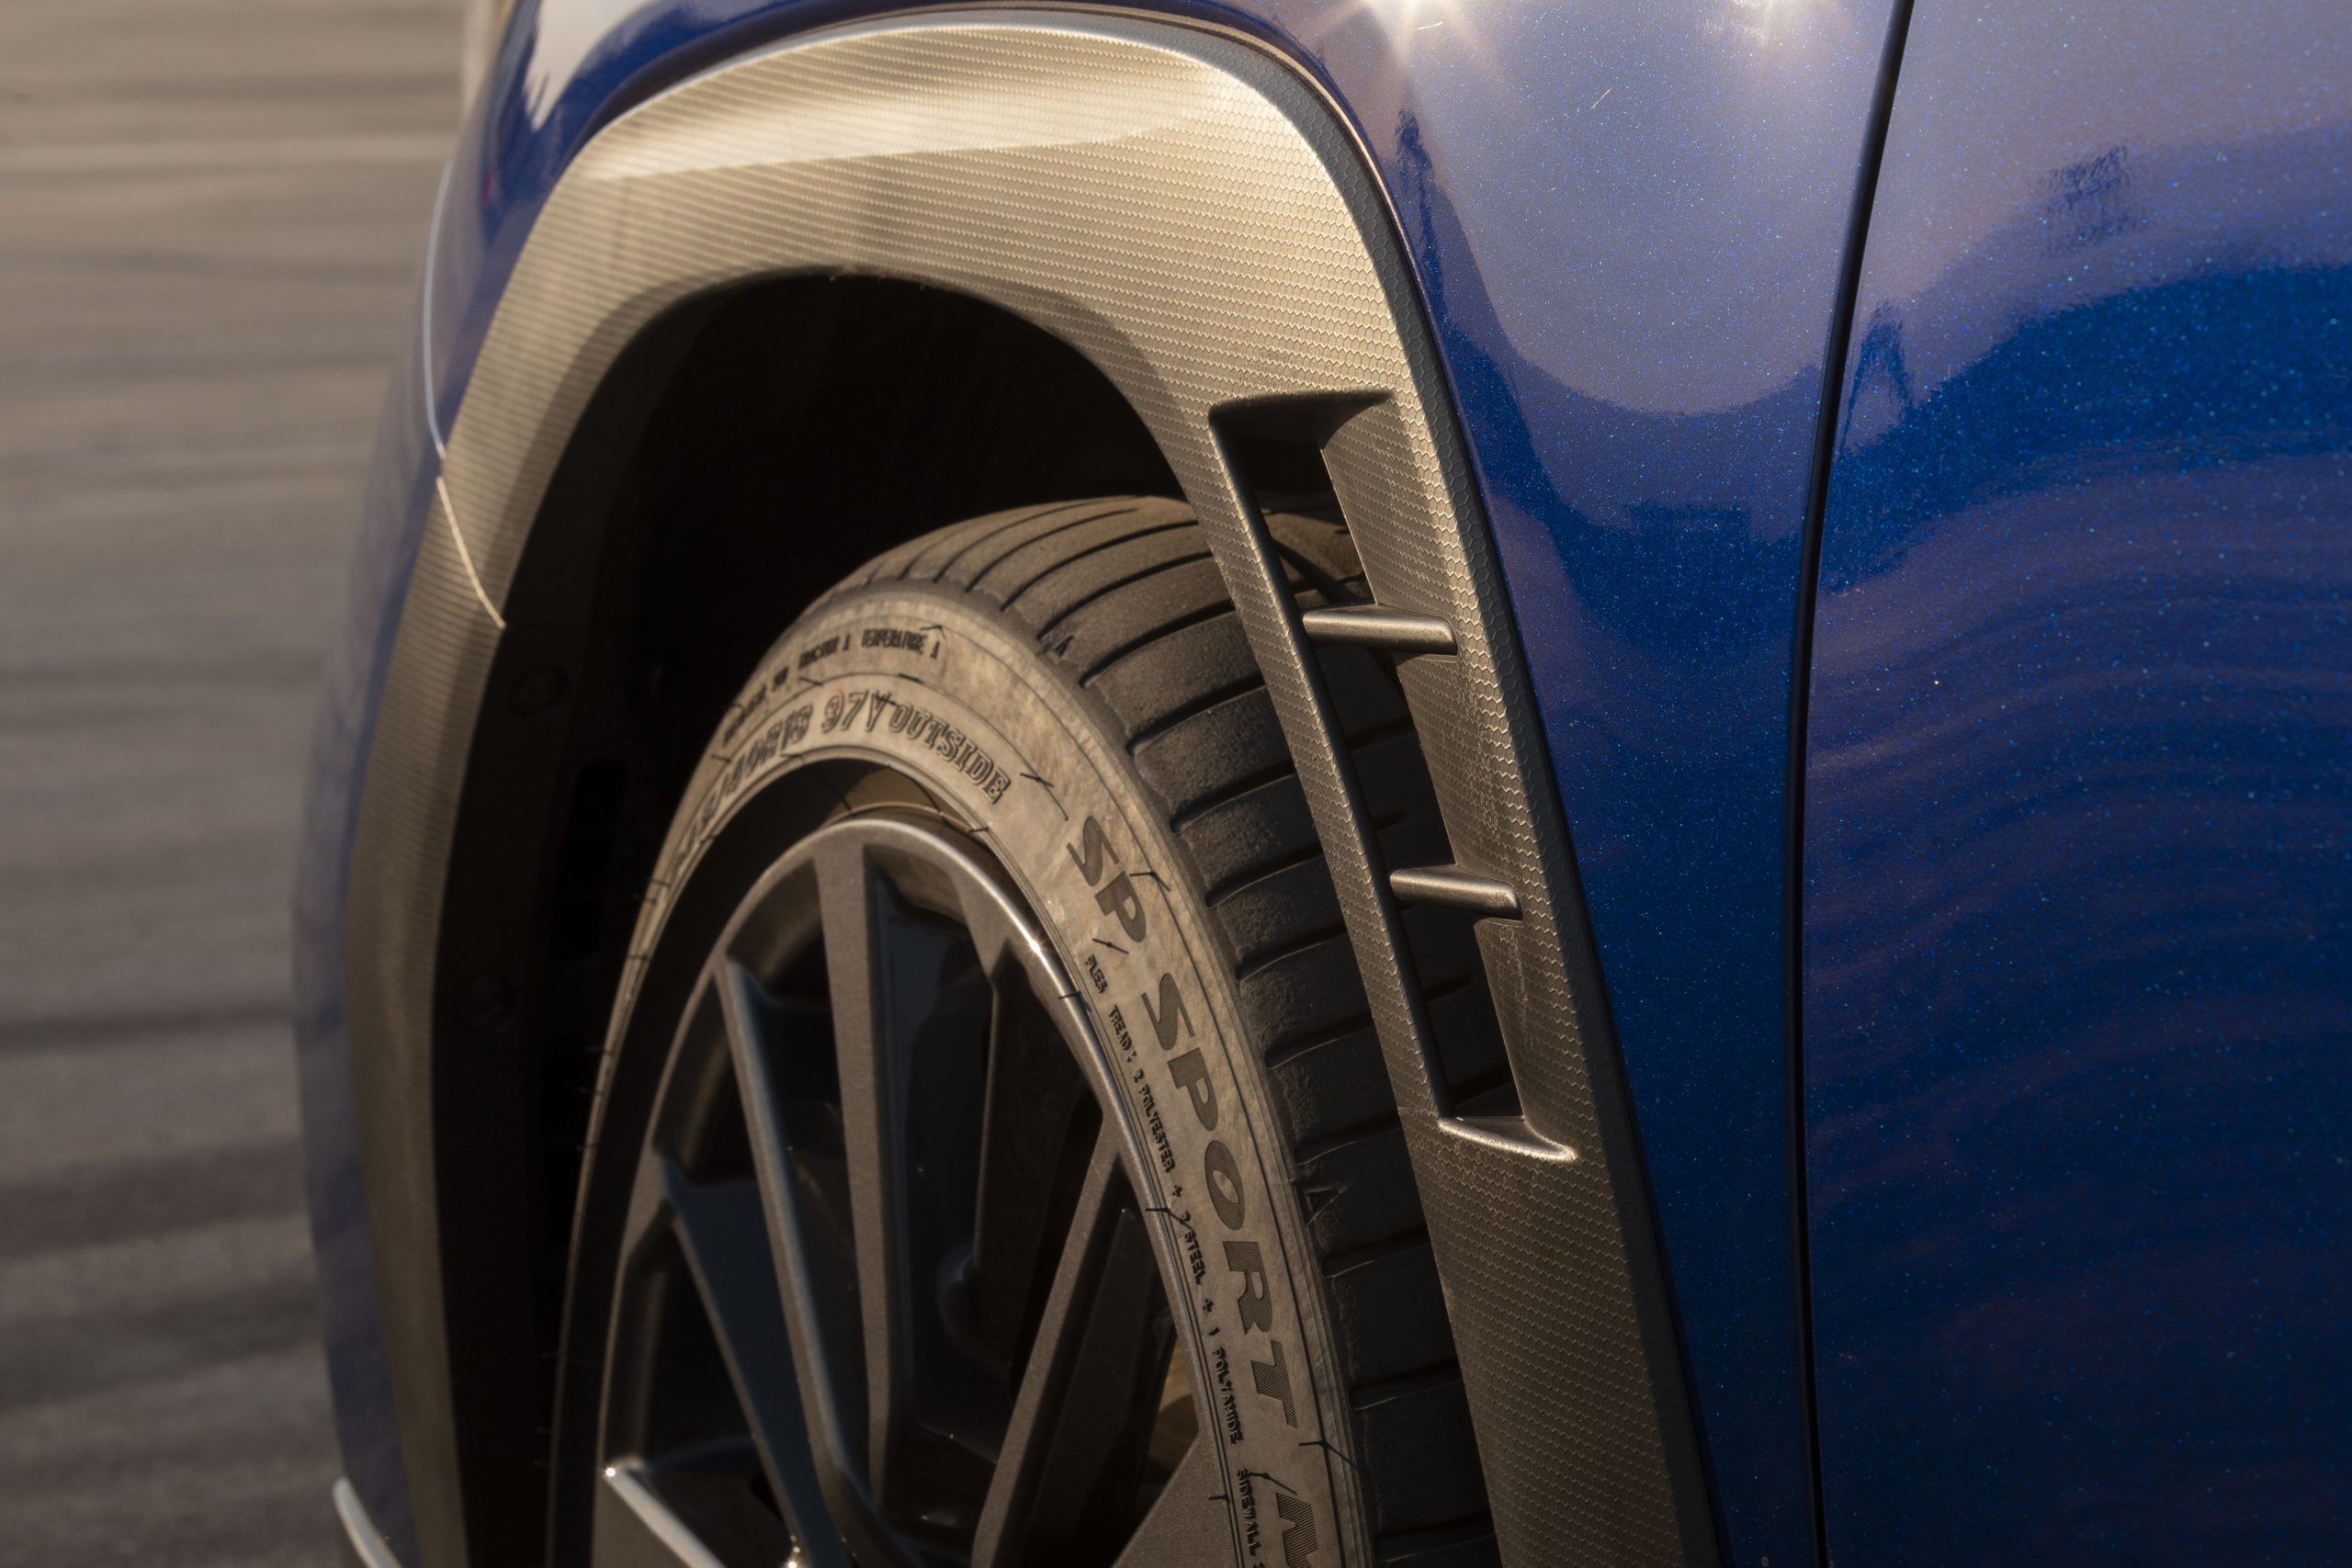 2022 Subaru WRX wheel tire trim detail